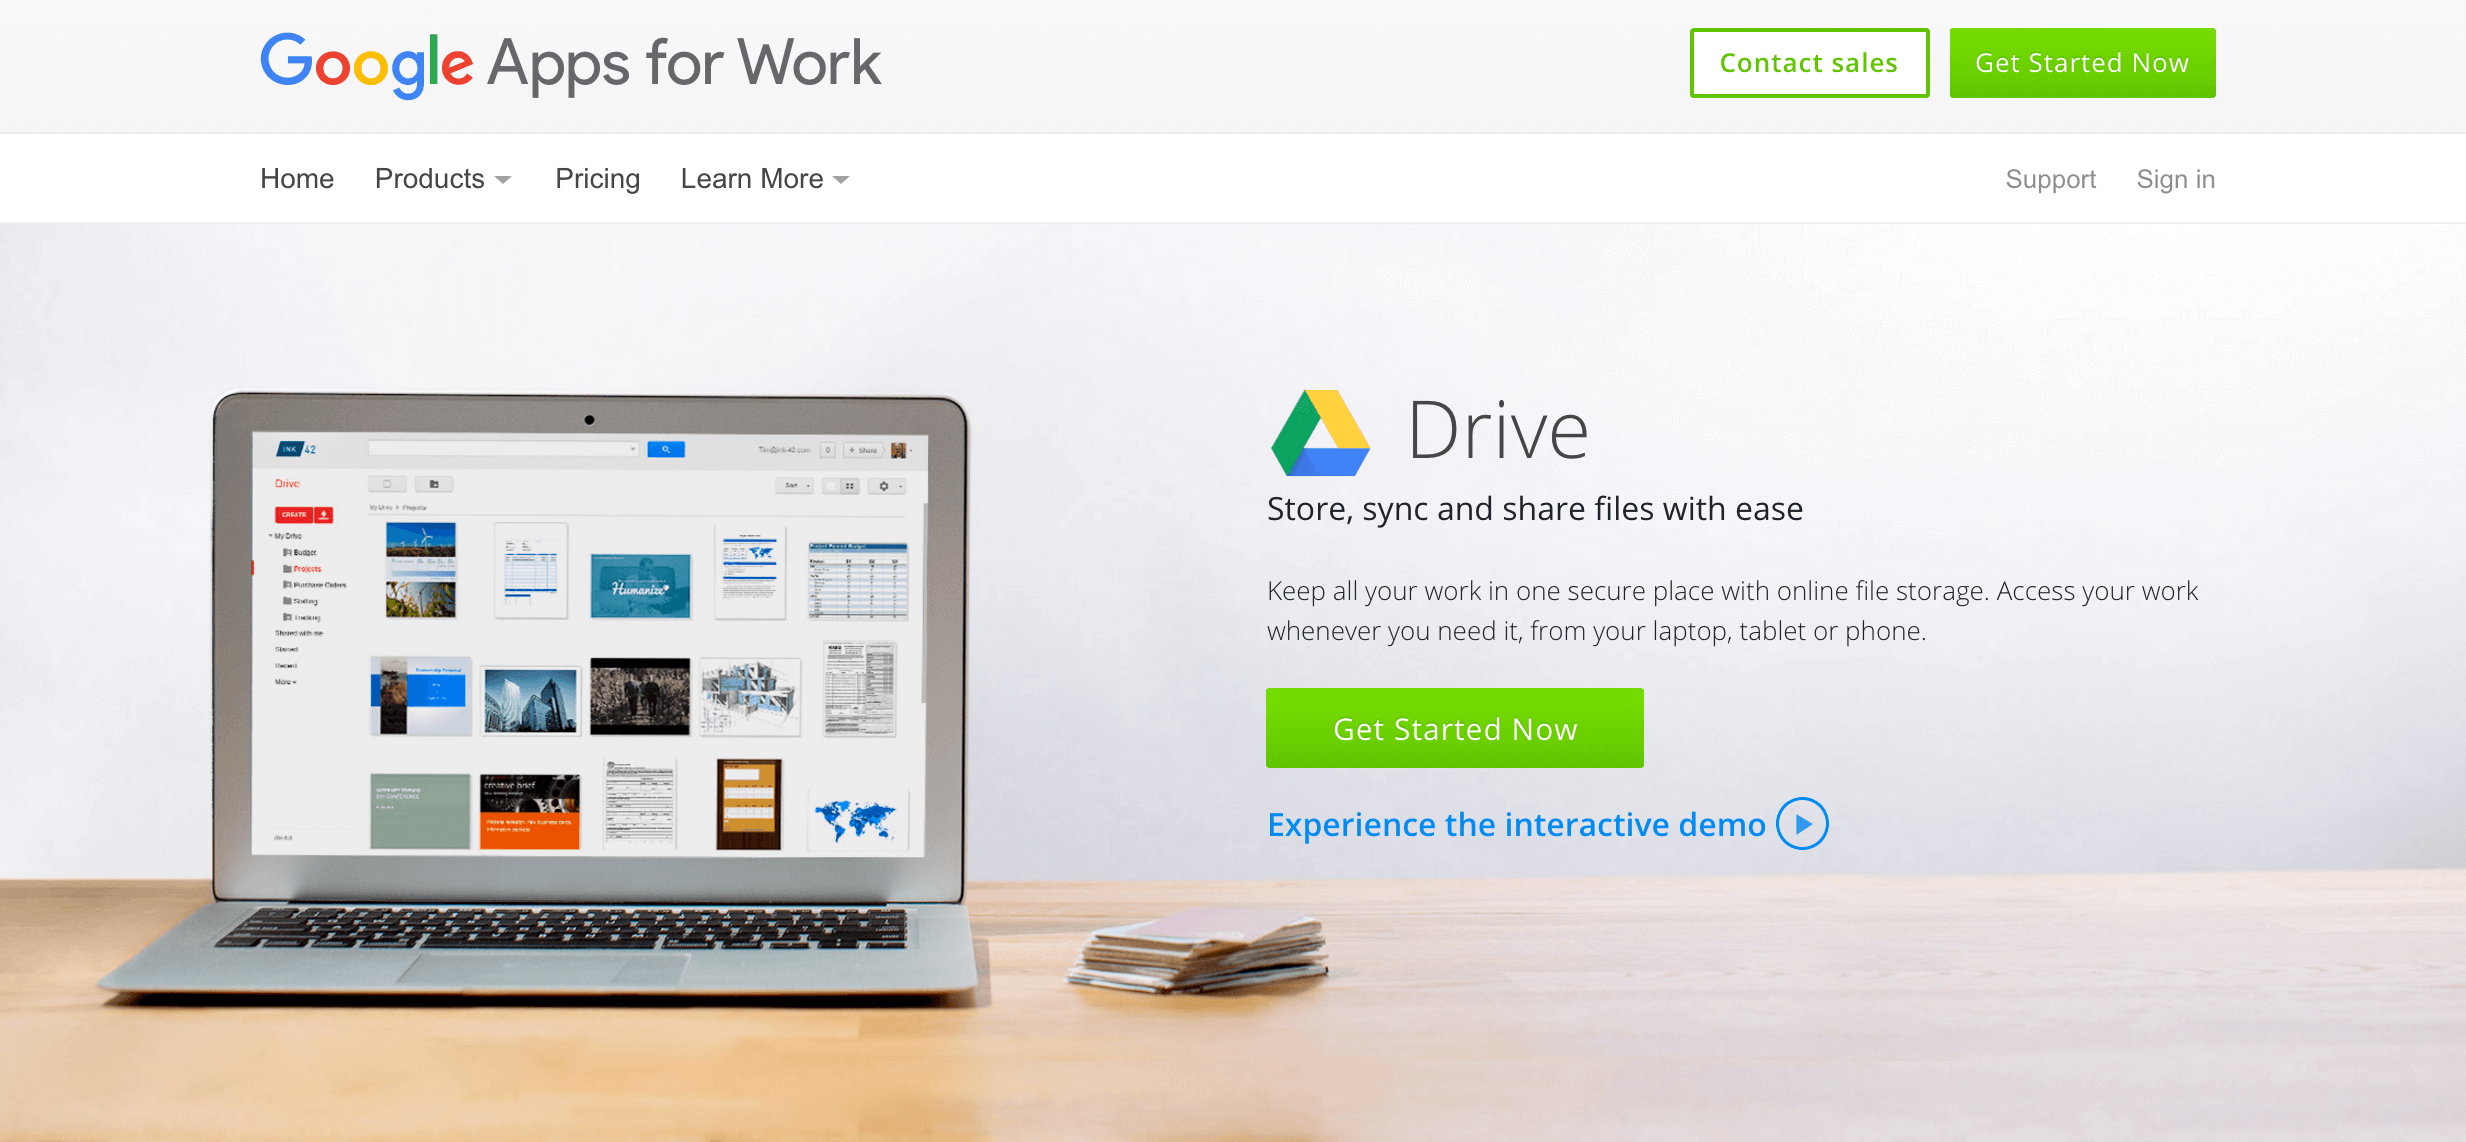 Google Drive cloud storage service